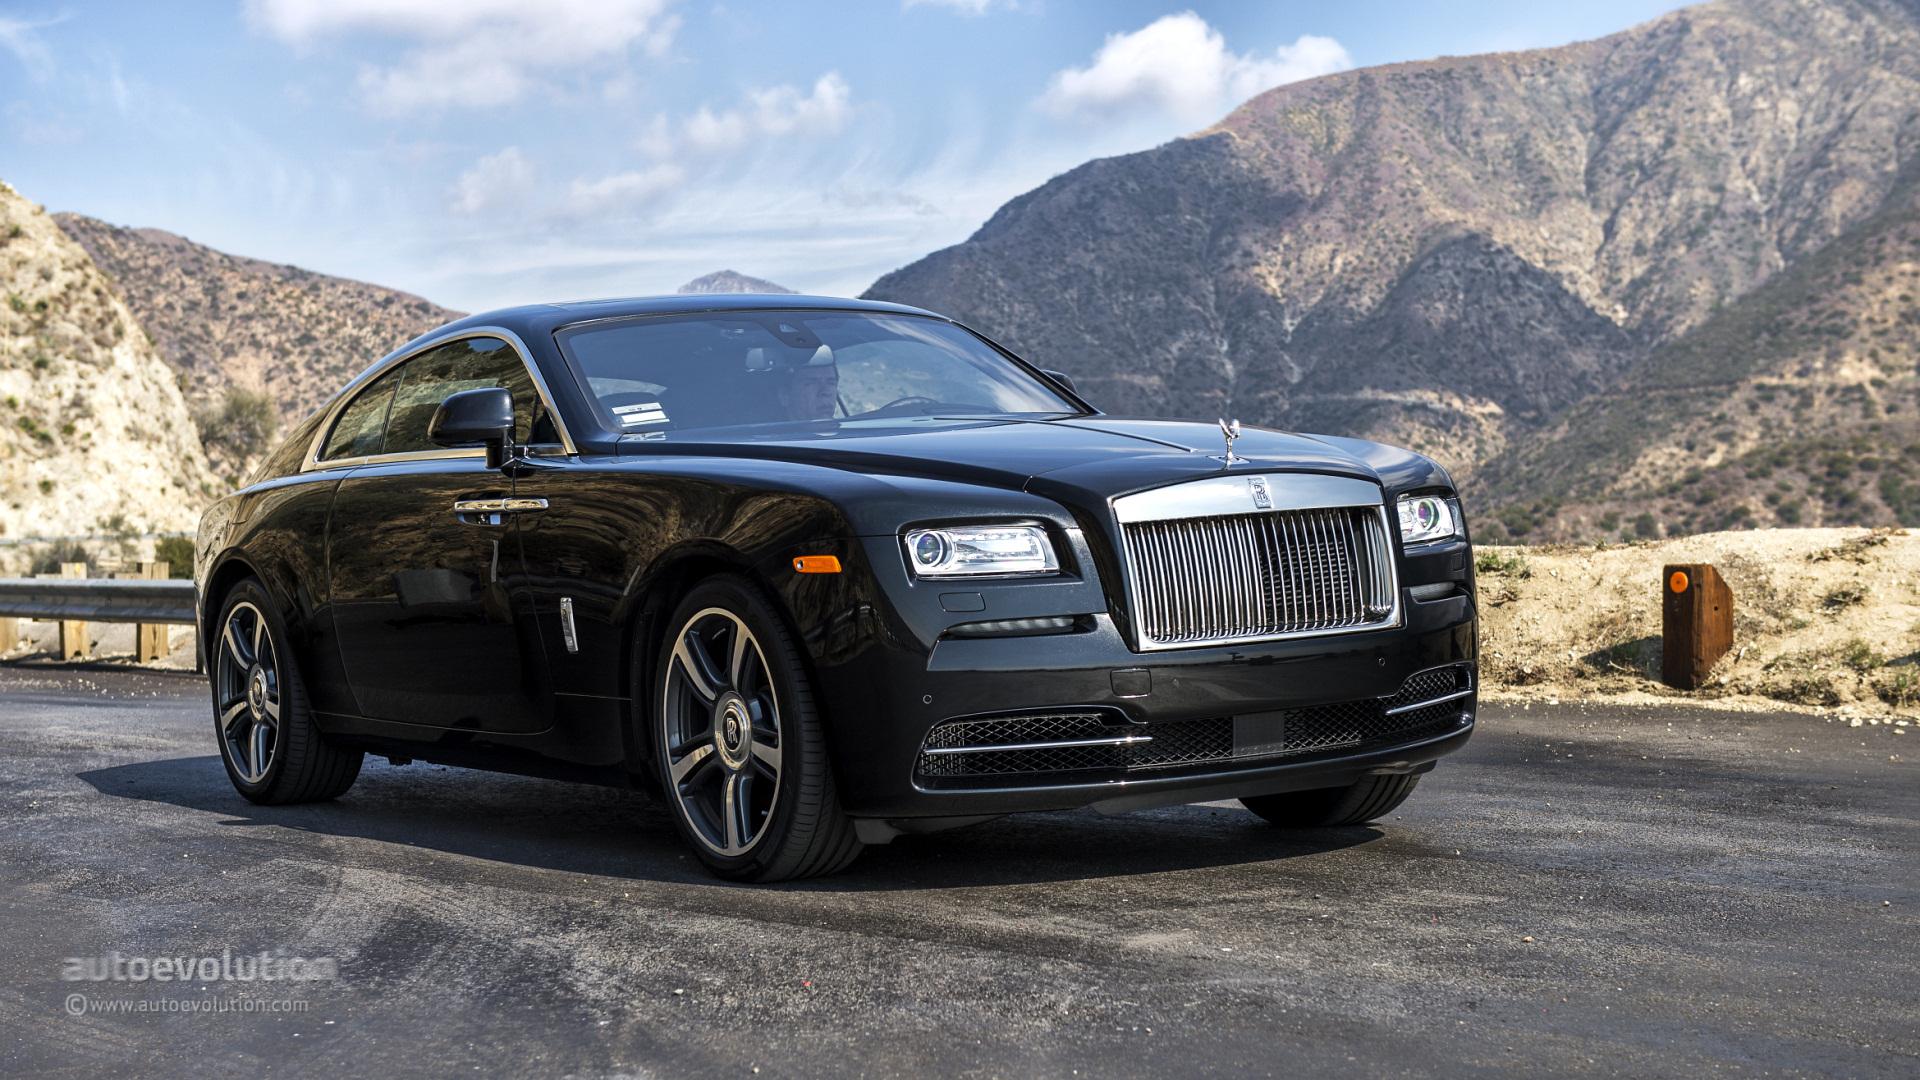 Rolls-Royce Wraith HD Wallpapers